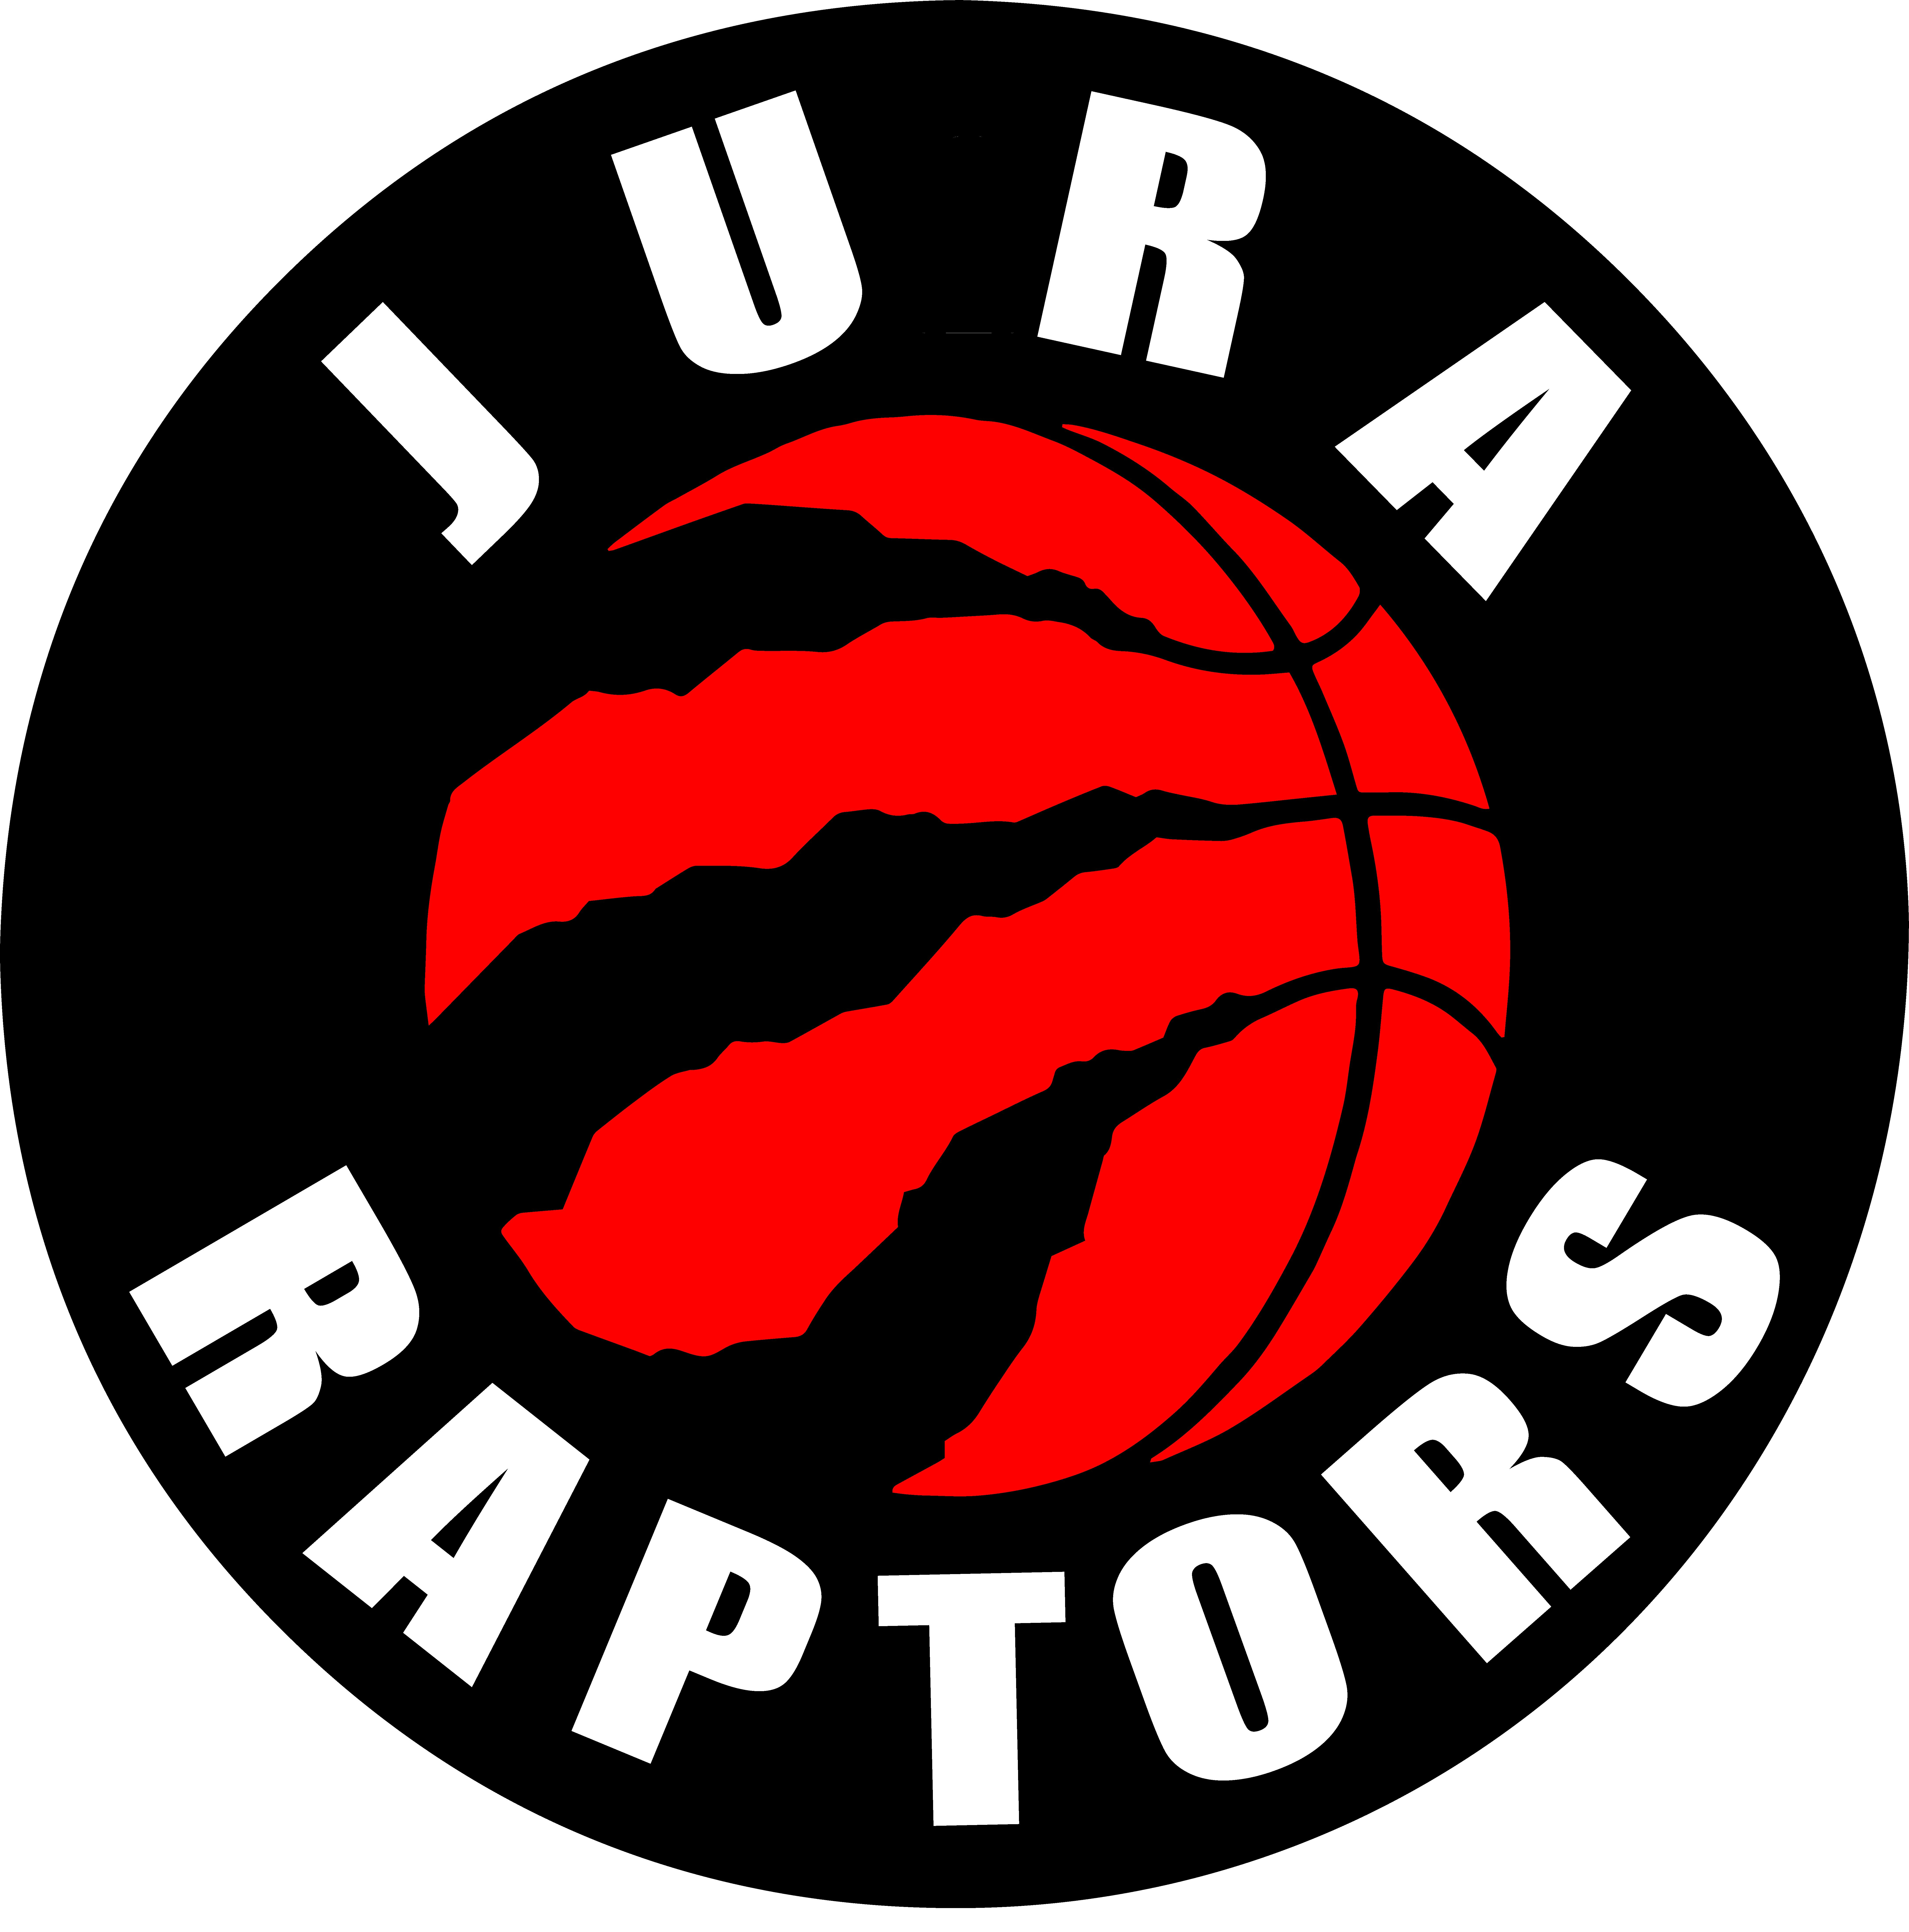 JURA RAPTORS